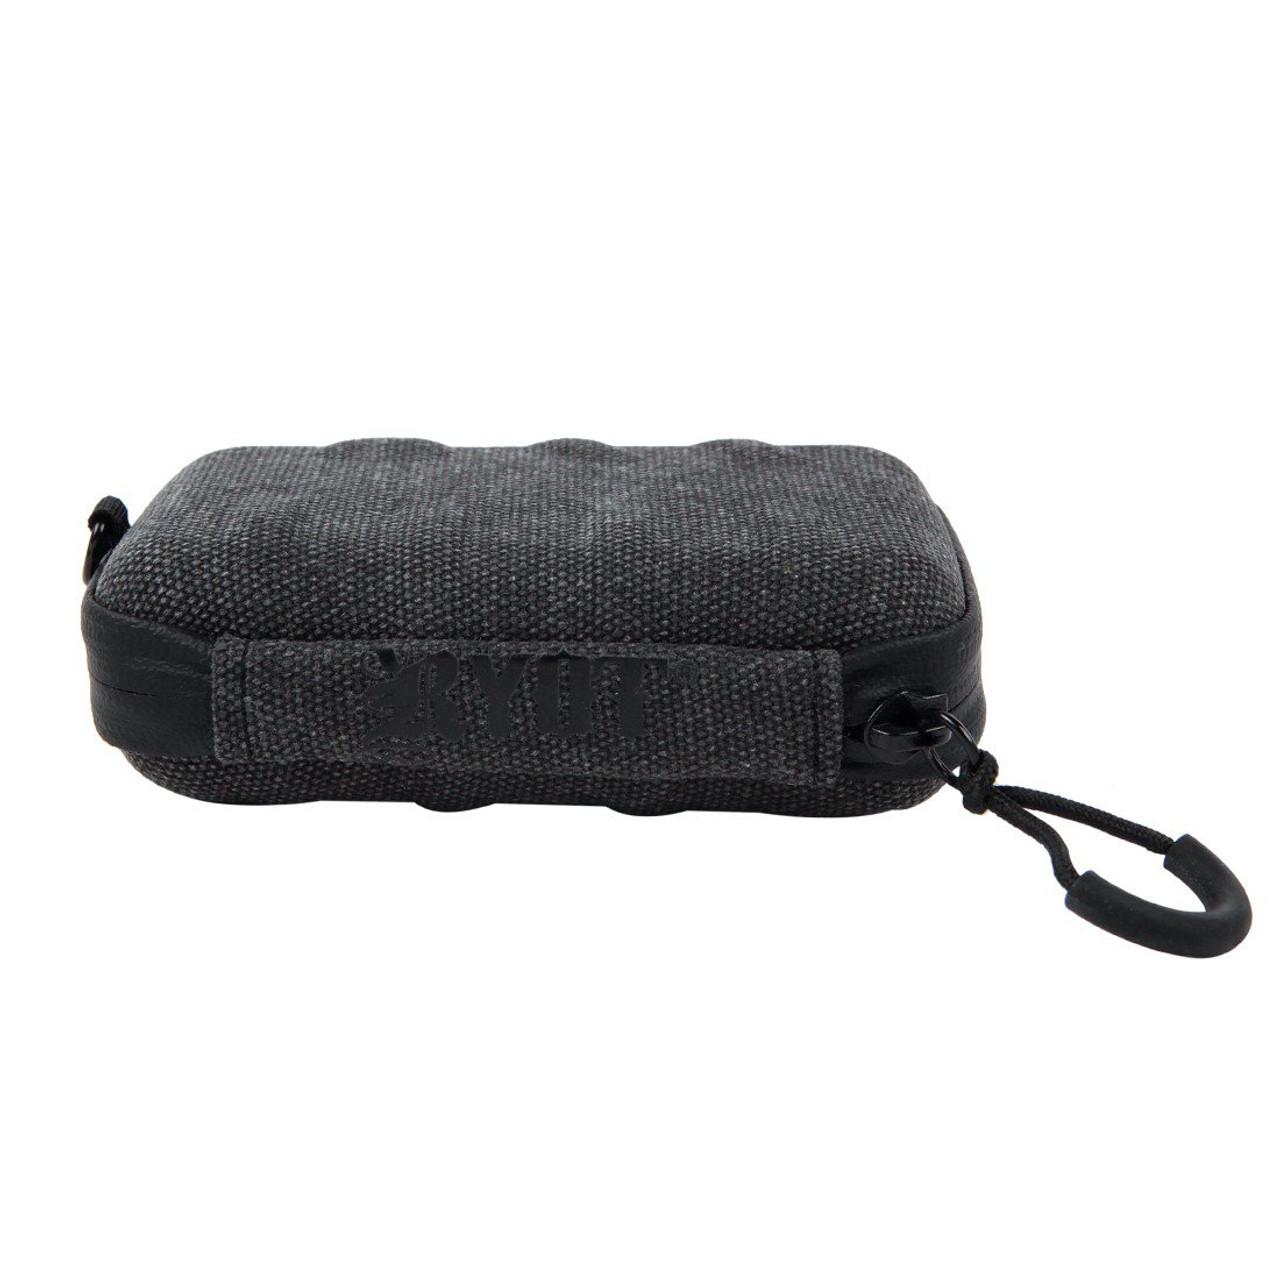 RYOT SmellSafe Hard Shell Krypto-Kit Assorted Six-Pack (2ea color)